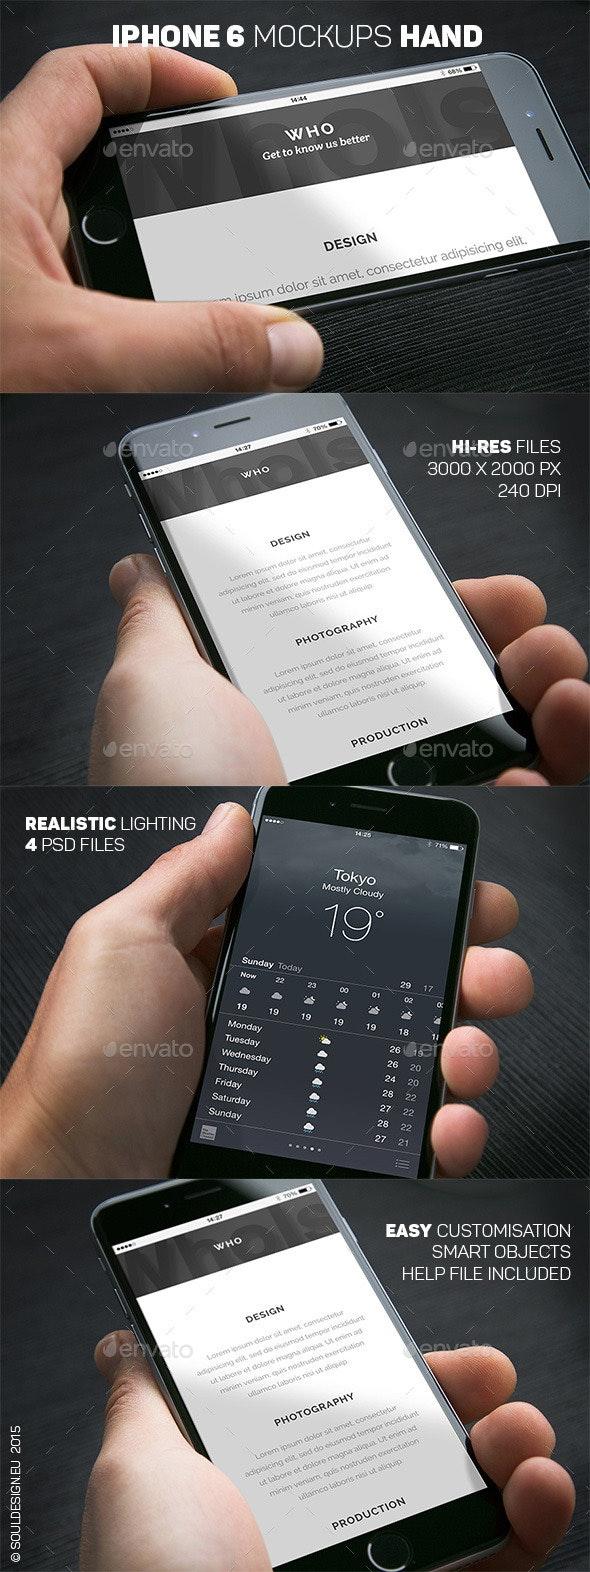 iPhone 6 Closeup Mockups Hand - Mobile Displays